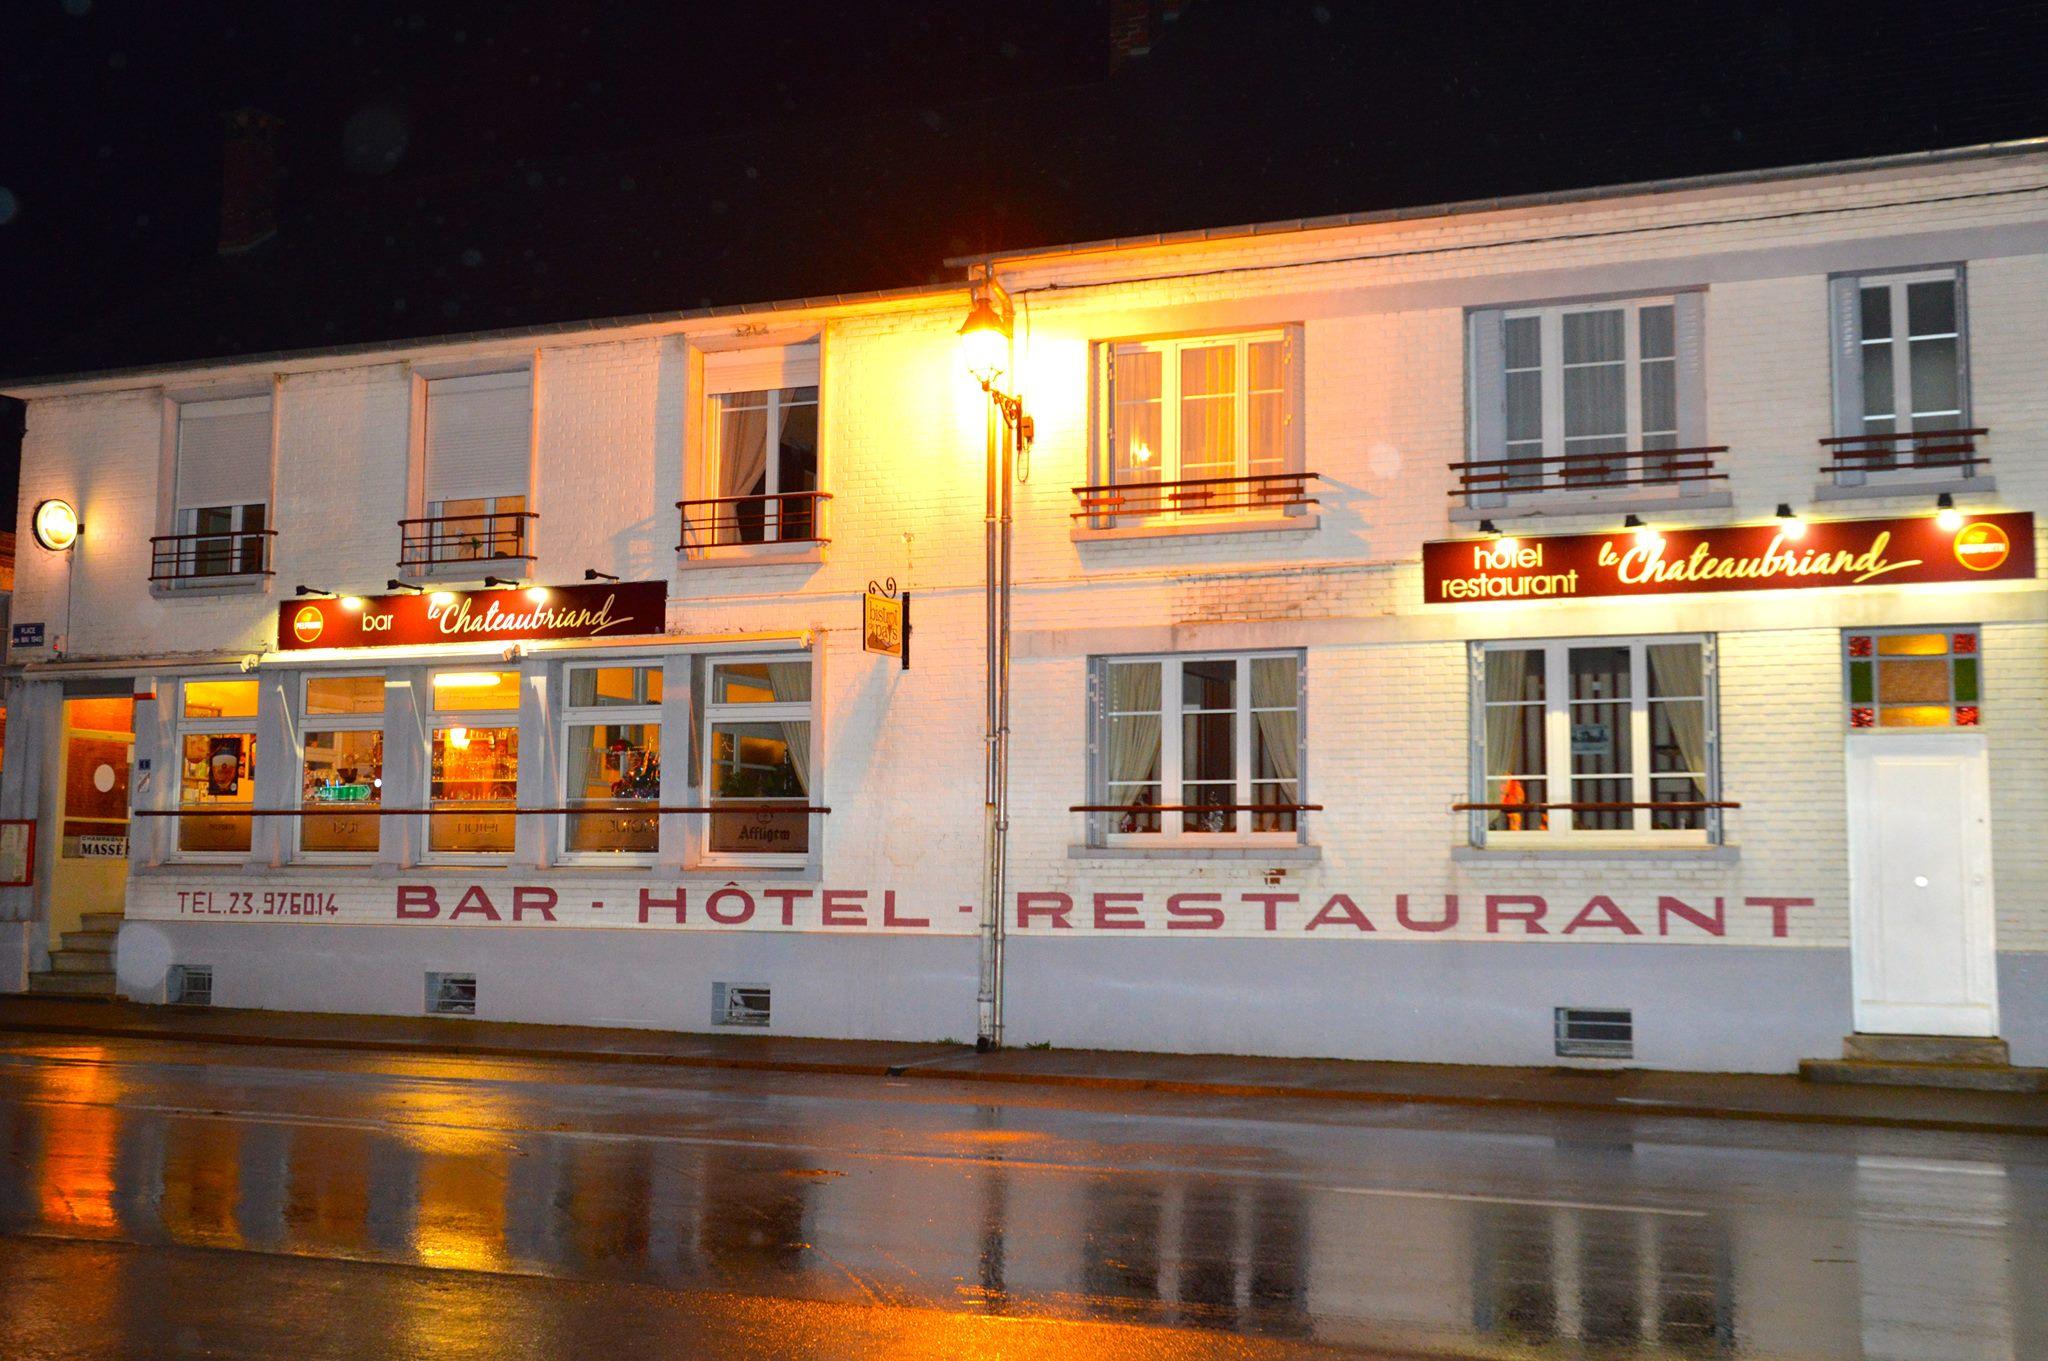 Restaurant aisne guide restaurants aisne - Buffalo grill saint pierre les elbeuf ...